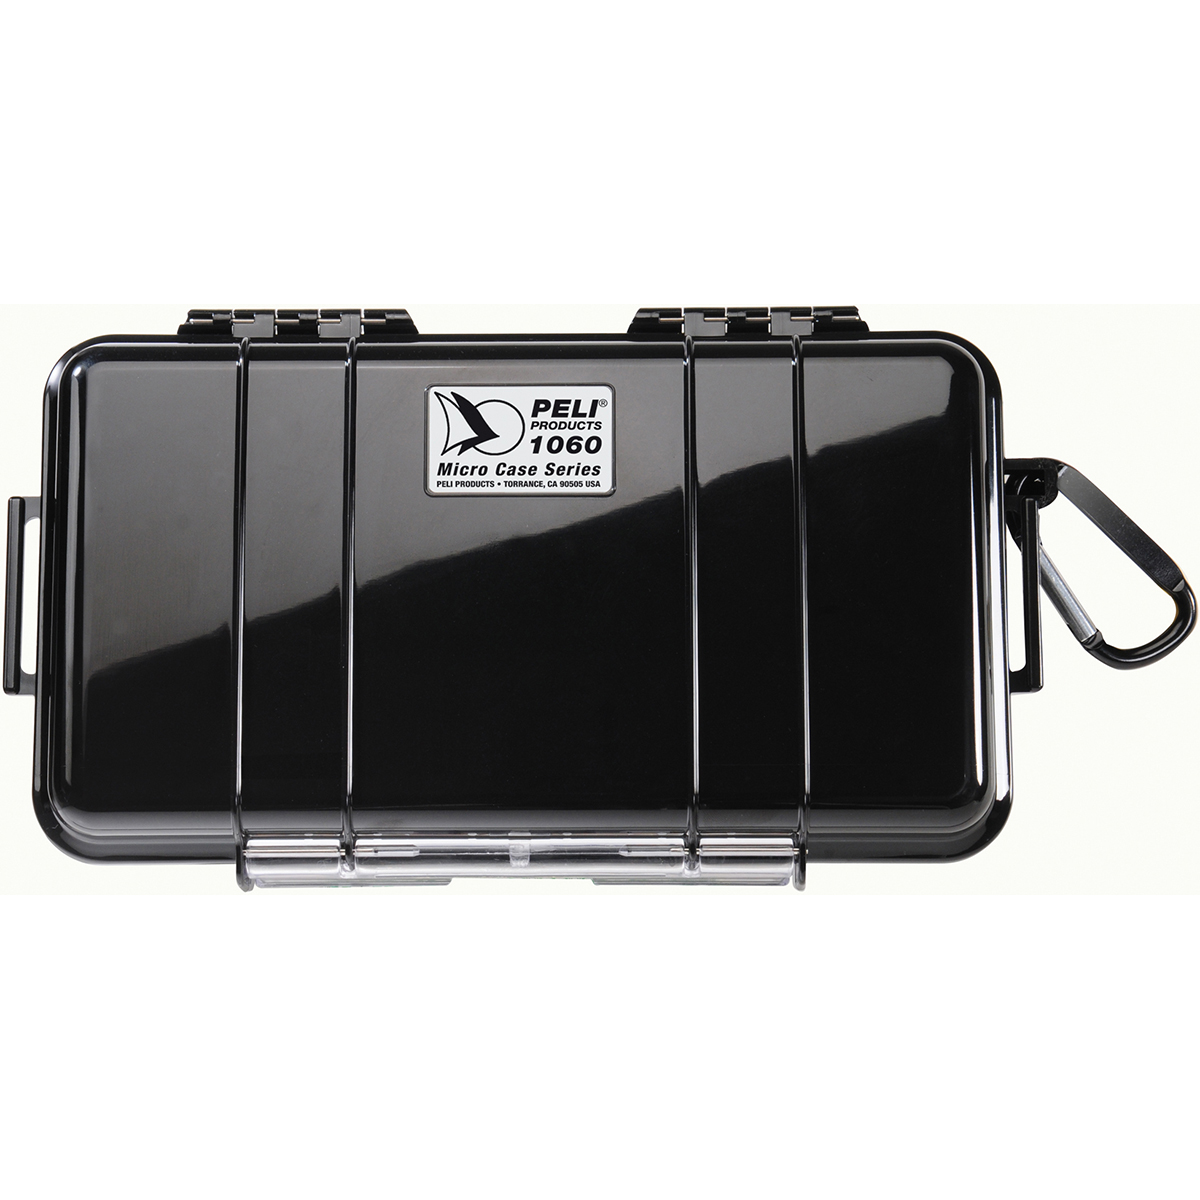 Peli Case 1060 Micro Zwart / Zwart